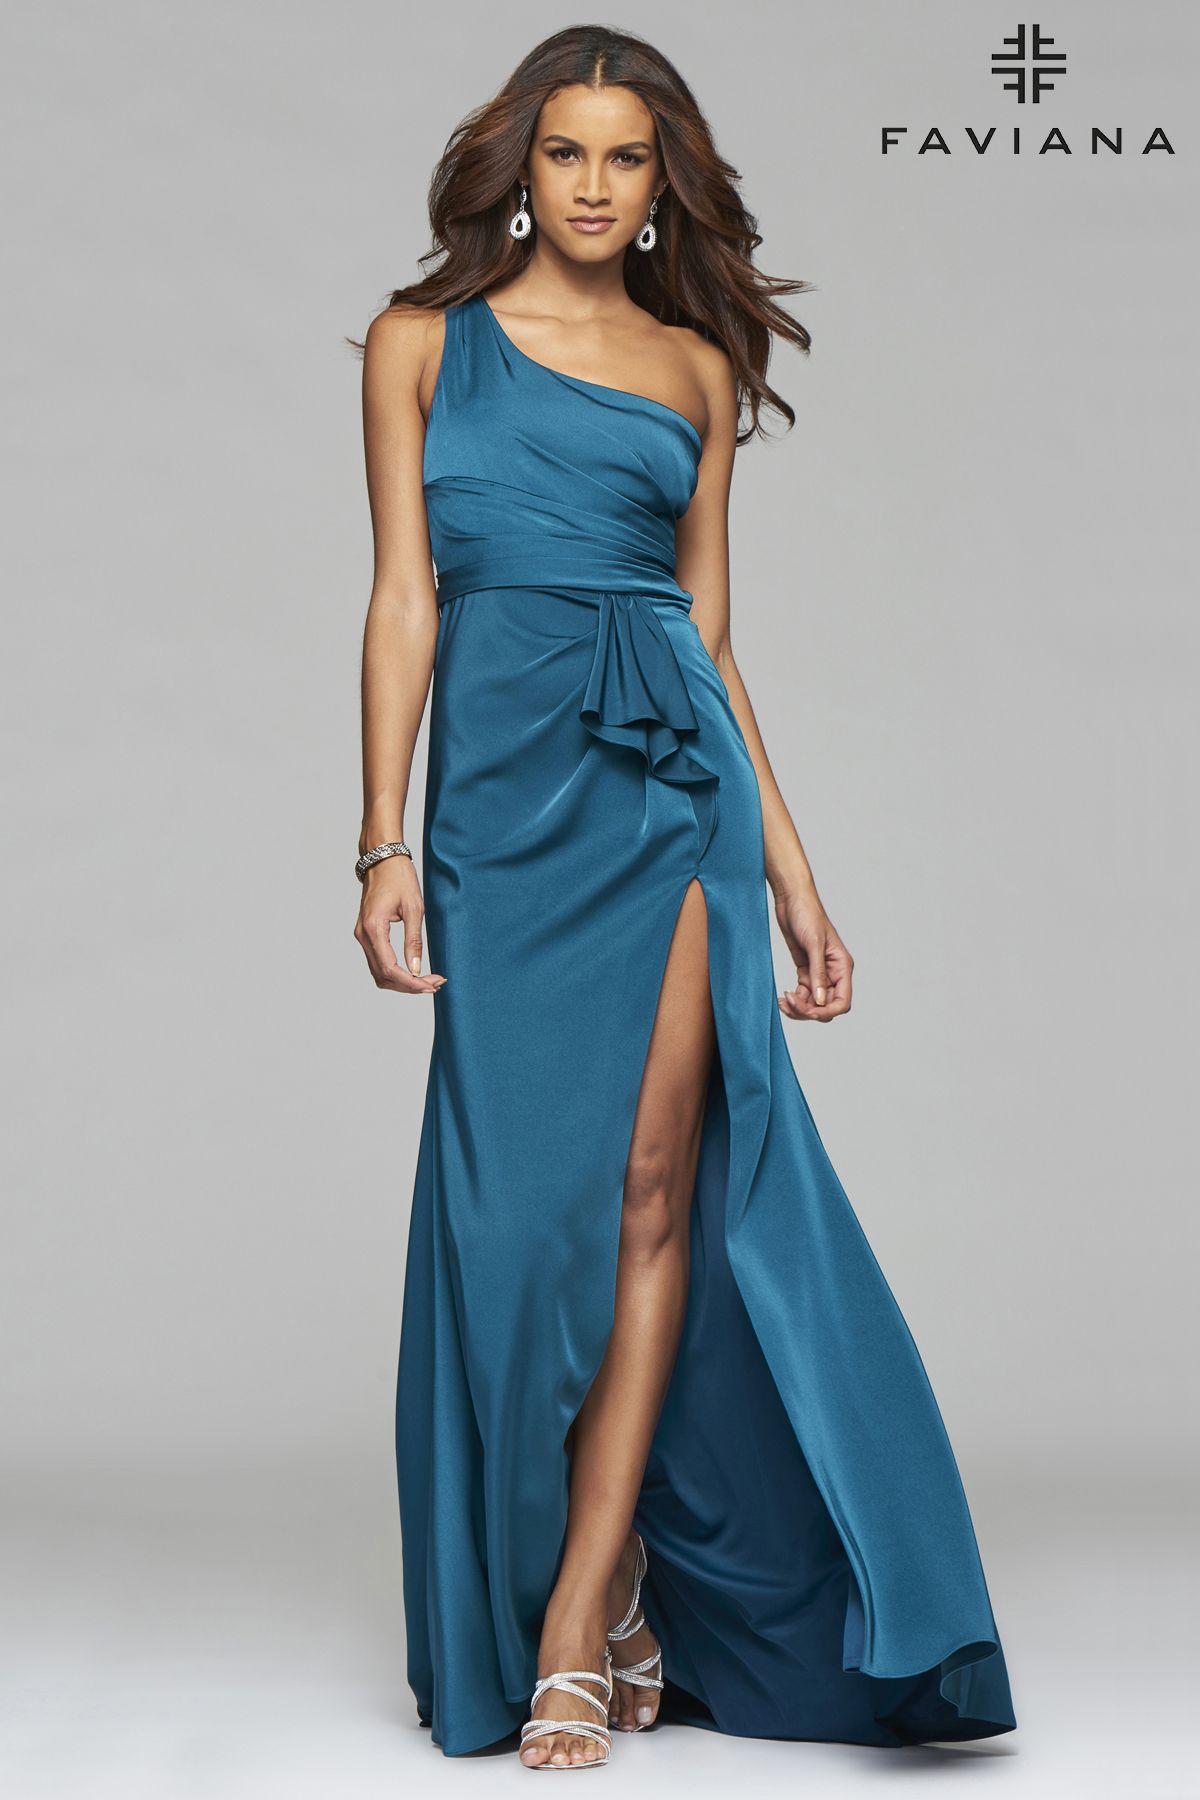 Faviana 7892 | Faviana | Pinterest | Galleries, Dresses and Prom dresses